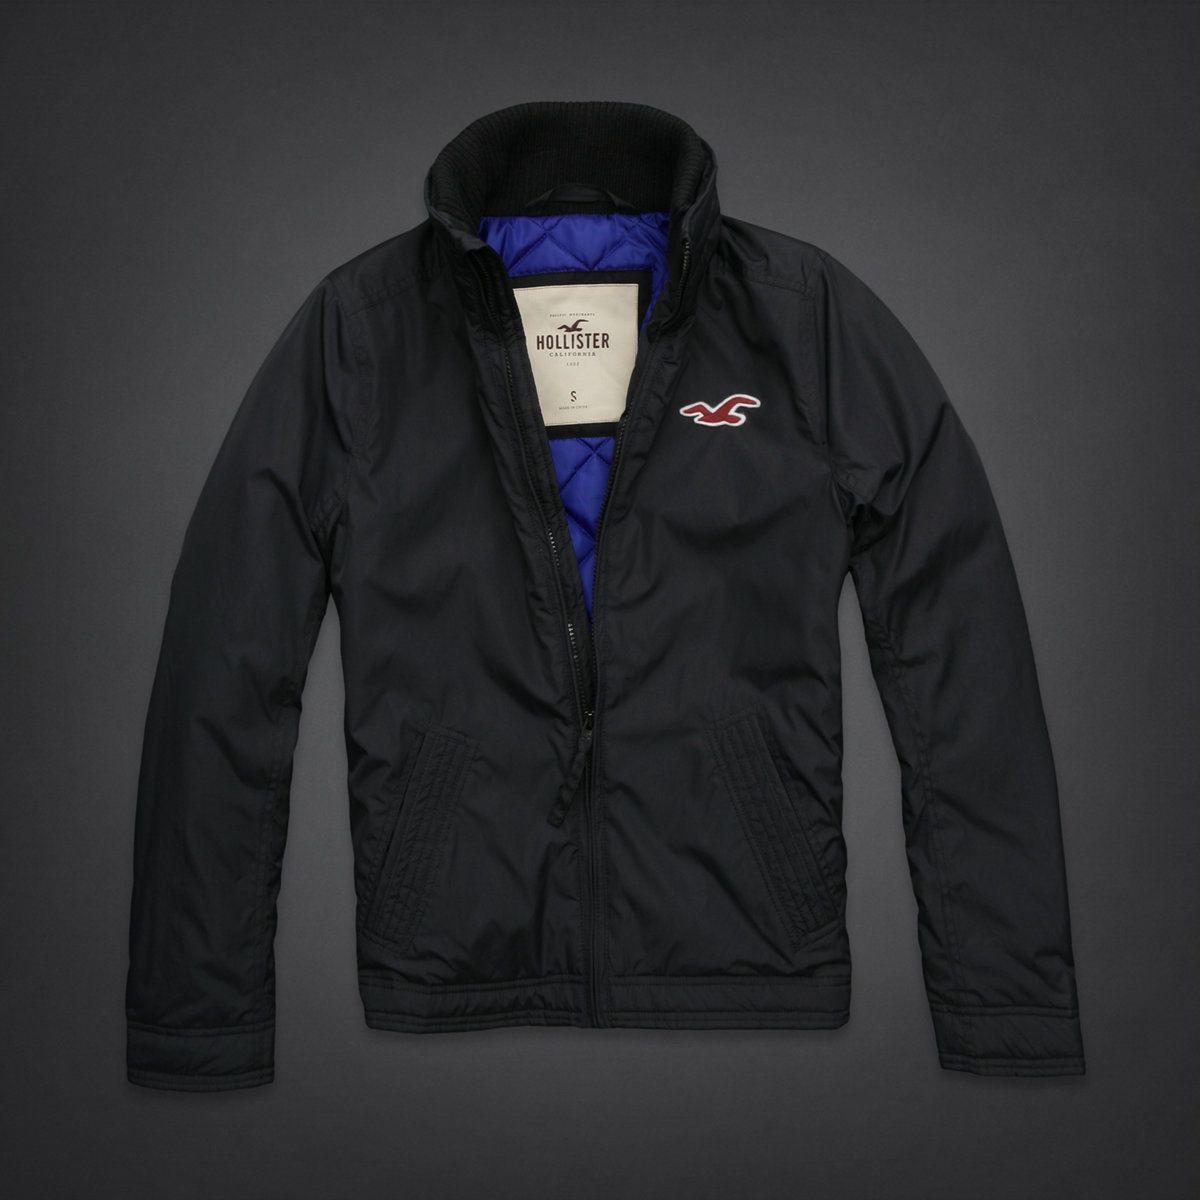 La Jolla Shores Jacket Jackets Outerwear Jackets Mens Outfits [ 1200 x 1200 Pixel ]